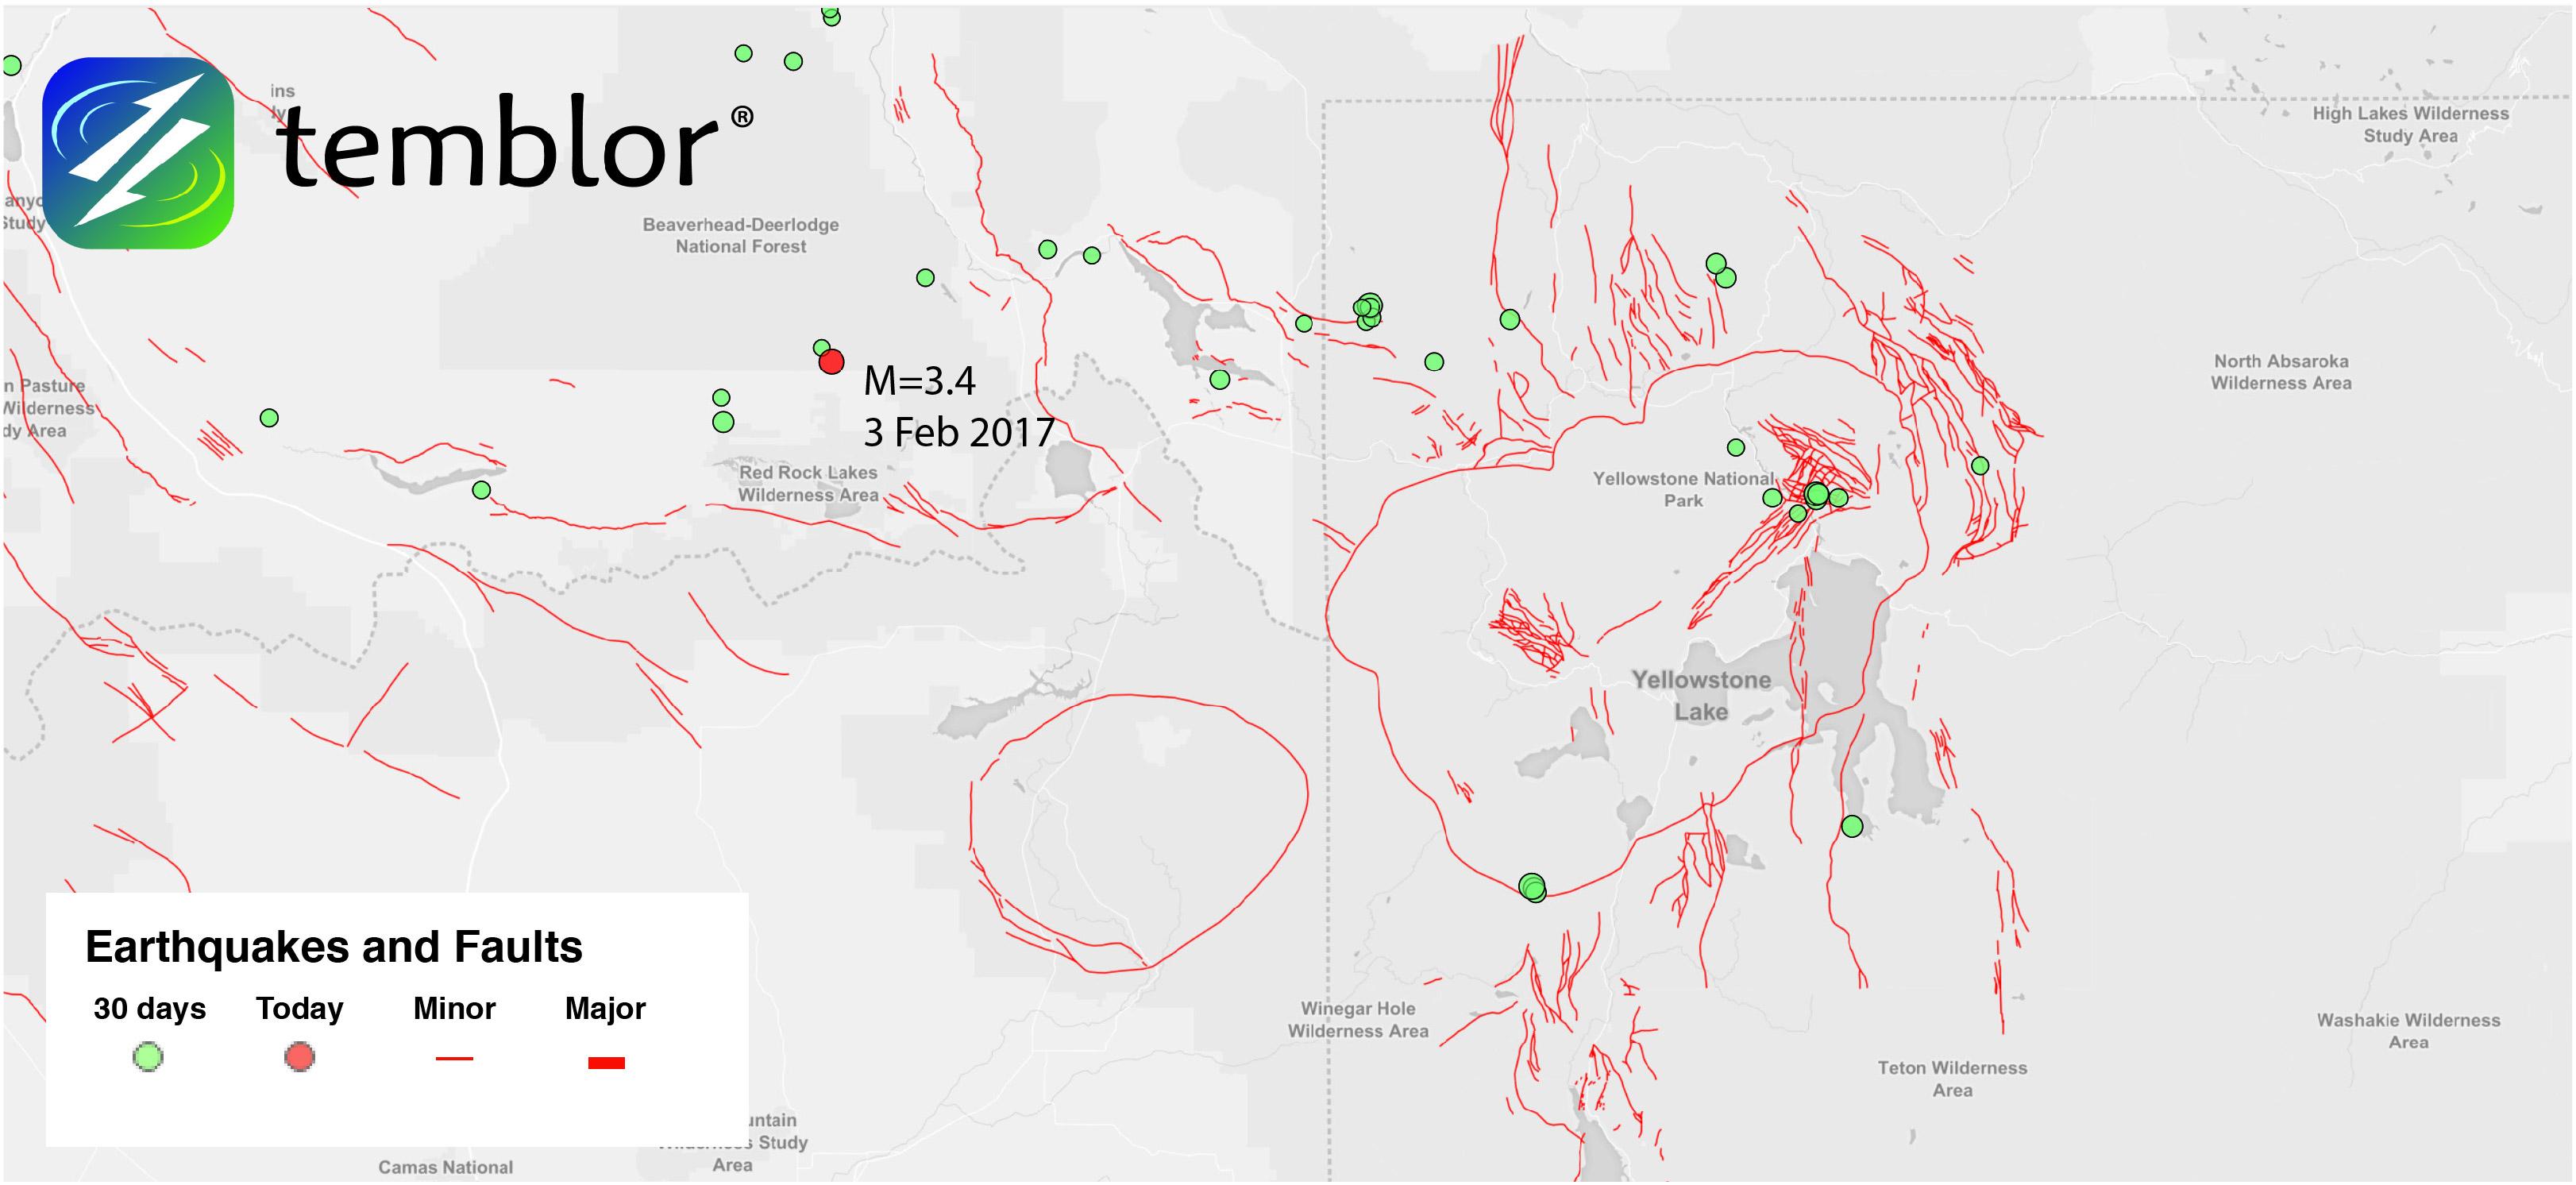 idaho-earthquake-map-yellowstone-national-park-earthquakes